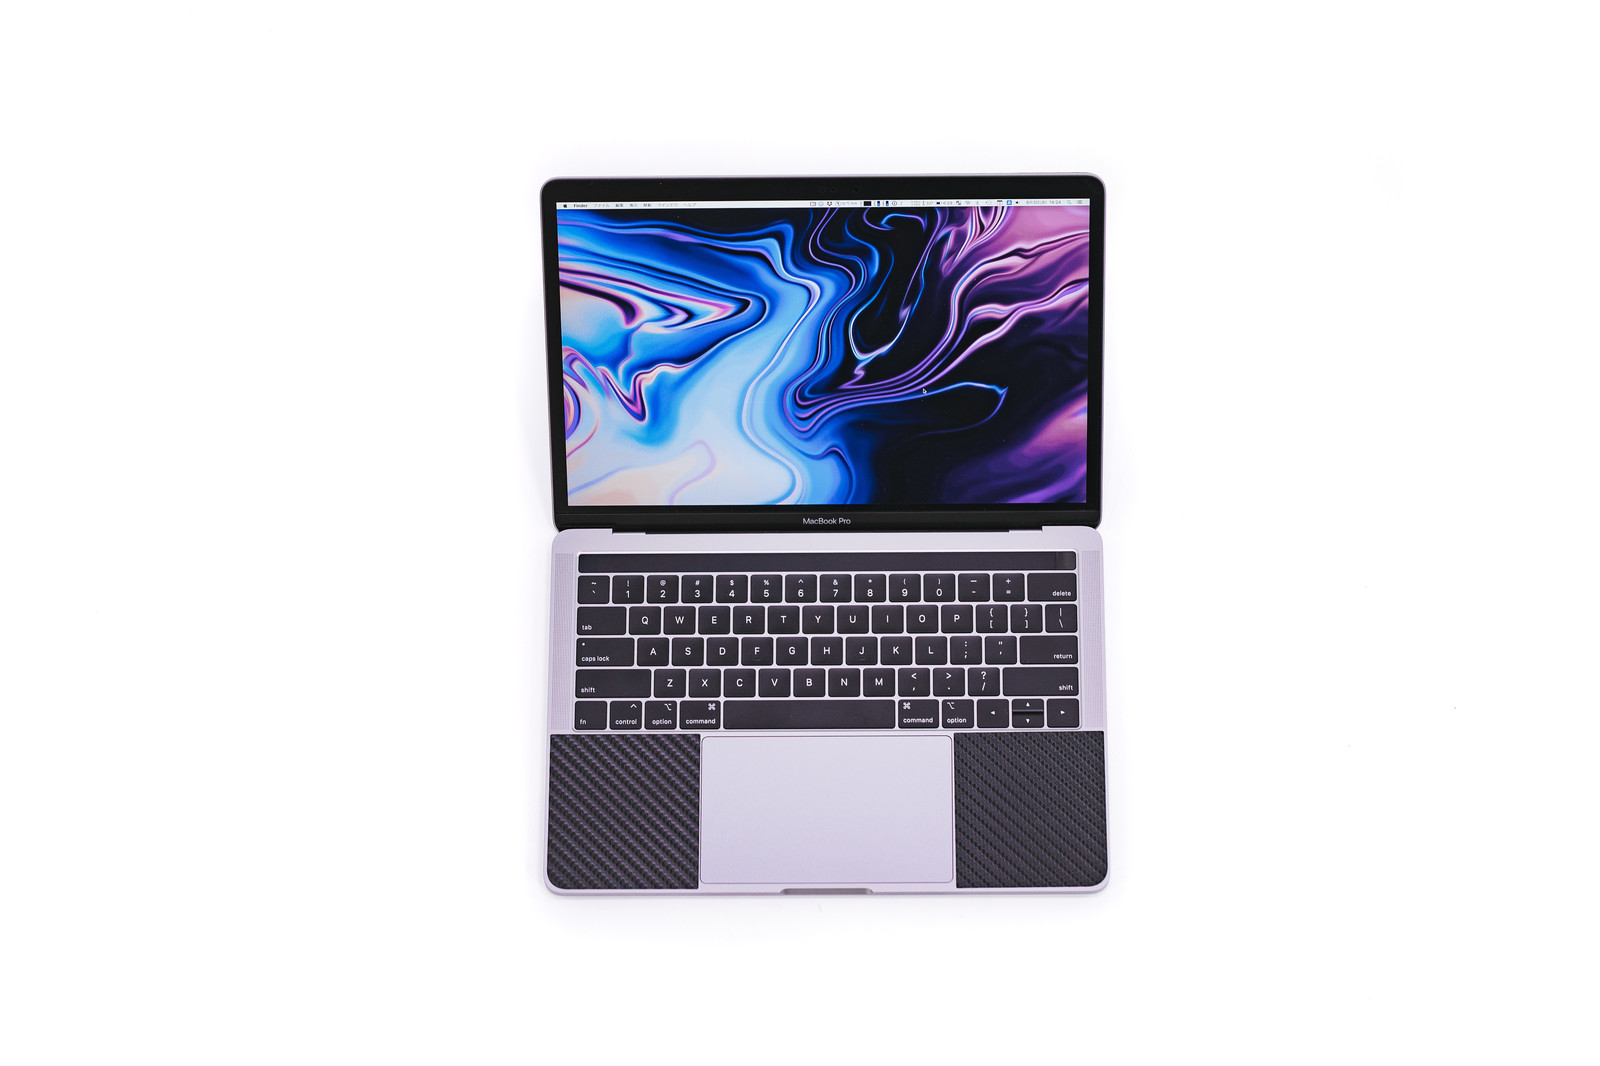 「MacBook Pro 2018 の画面とキーボード」の写真